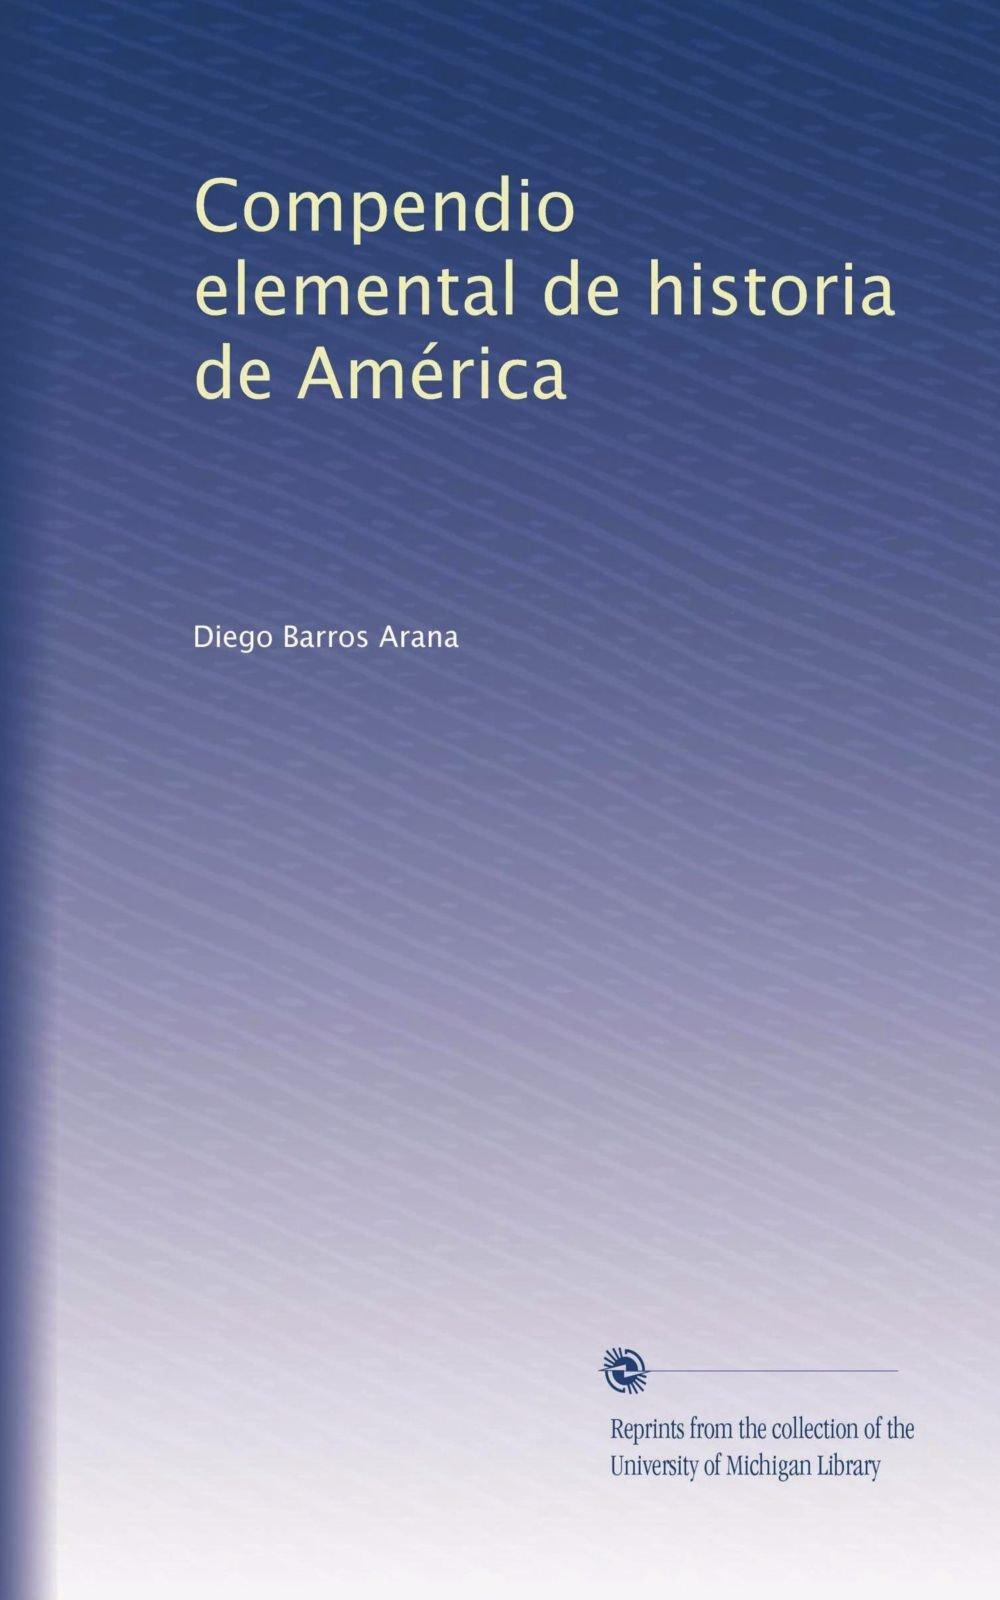 Compendio elemental de historia de América (Spanish Edition) PDF